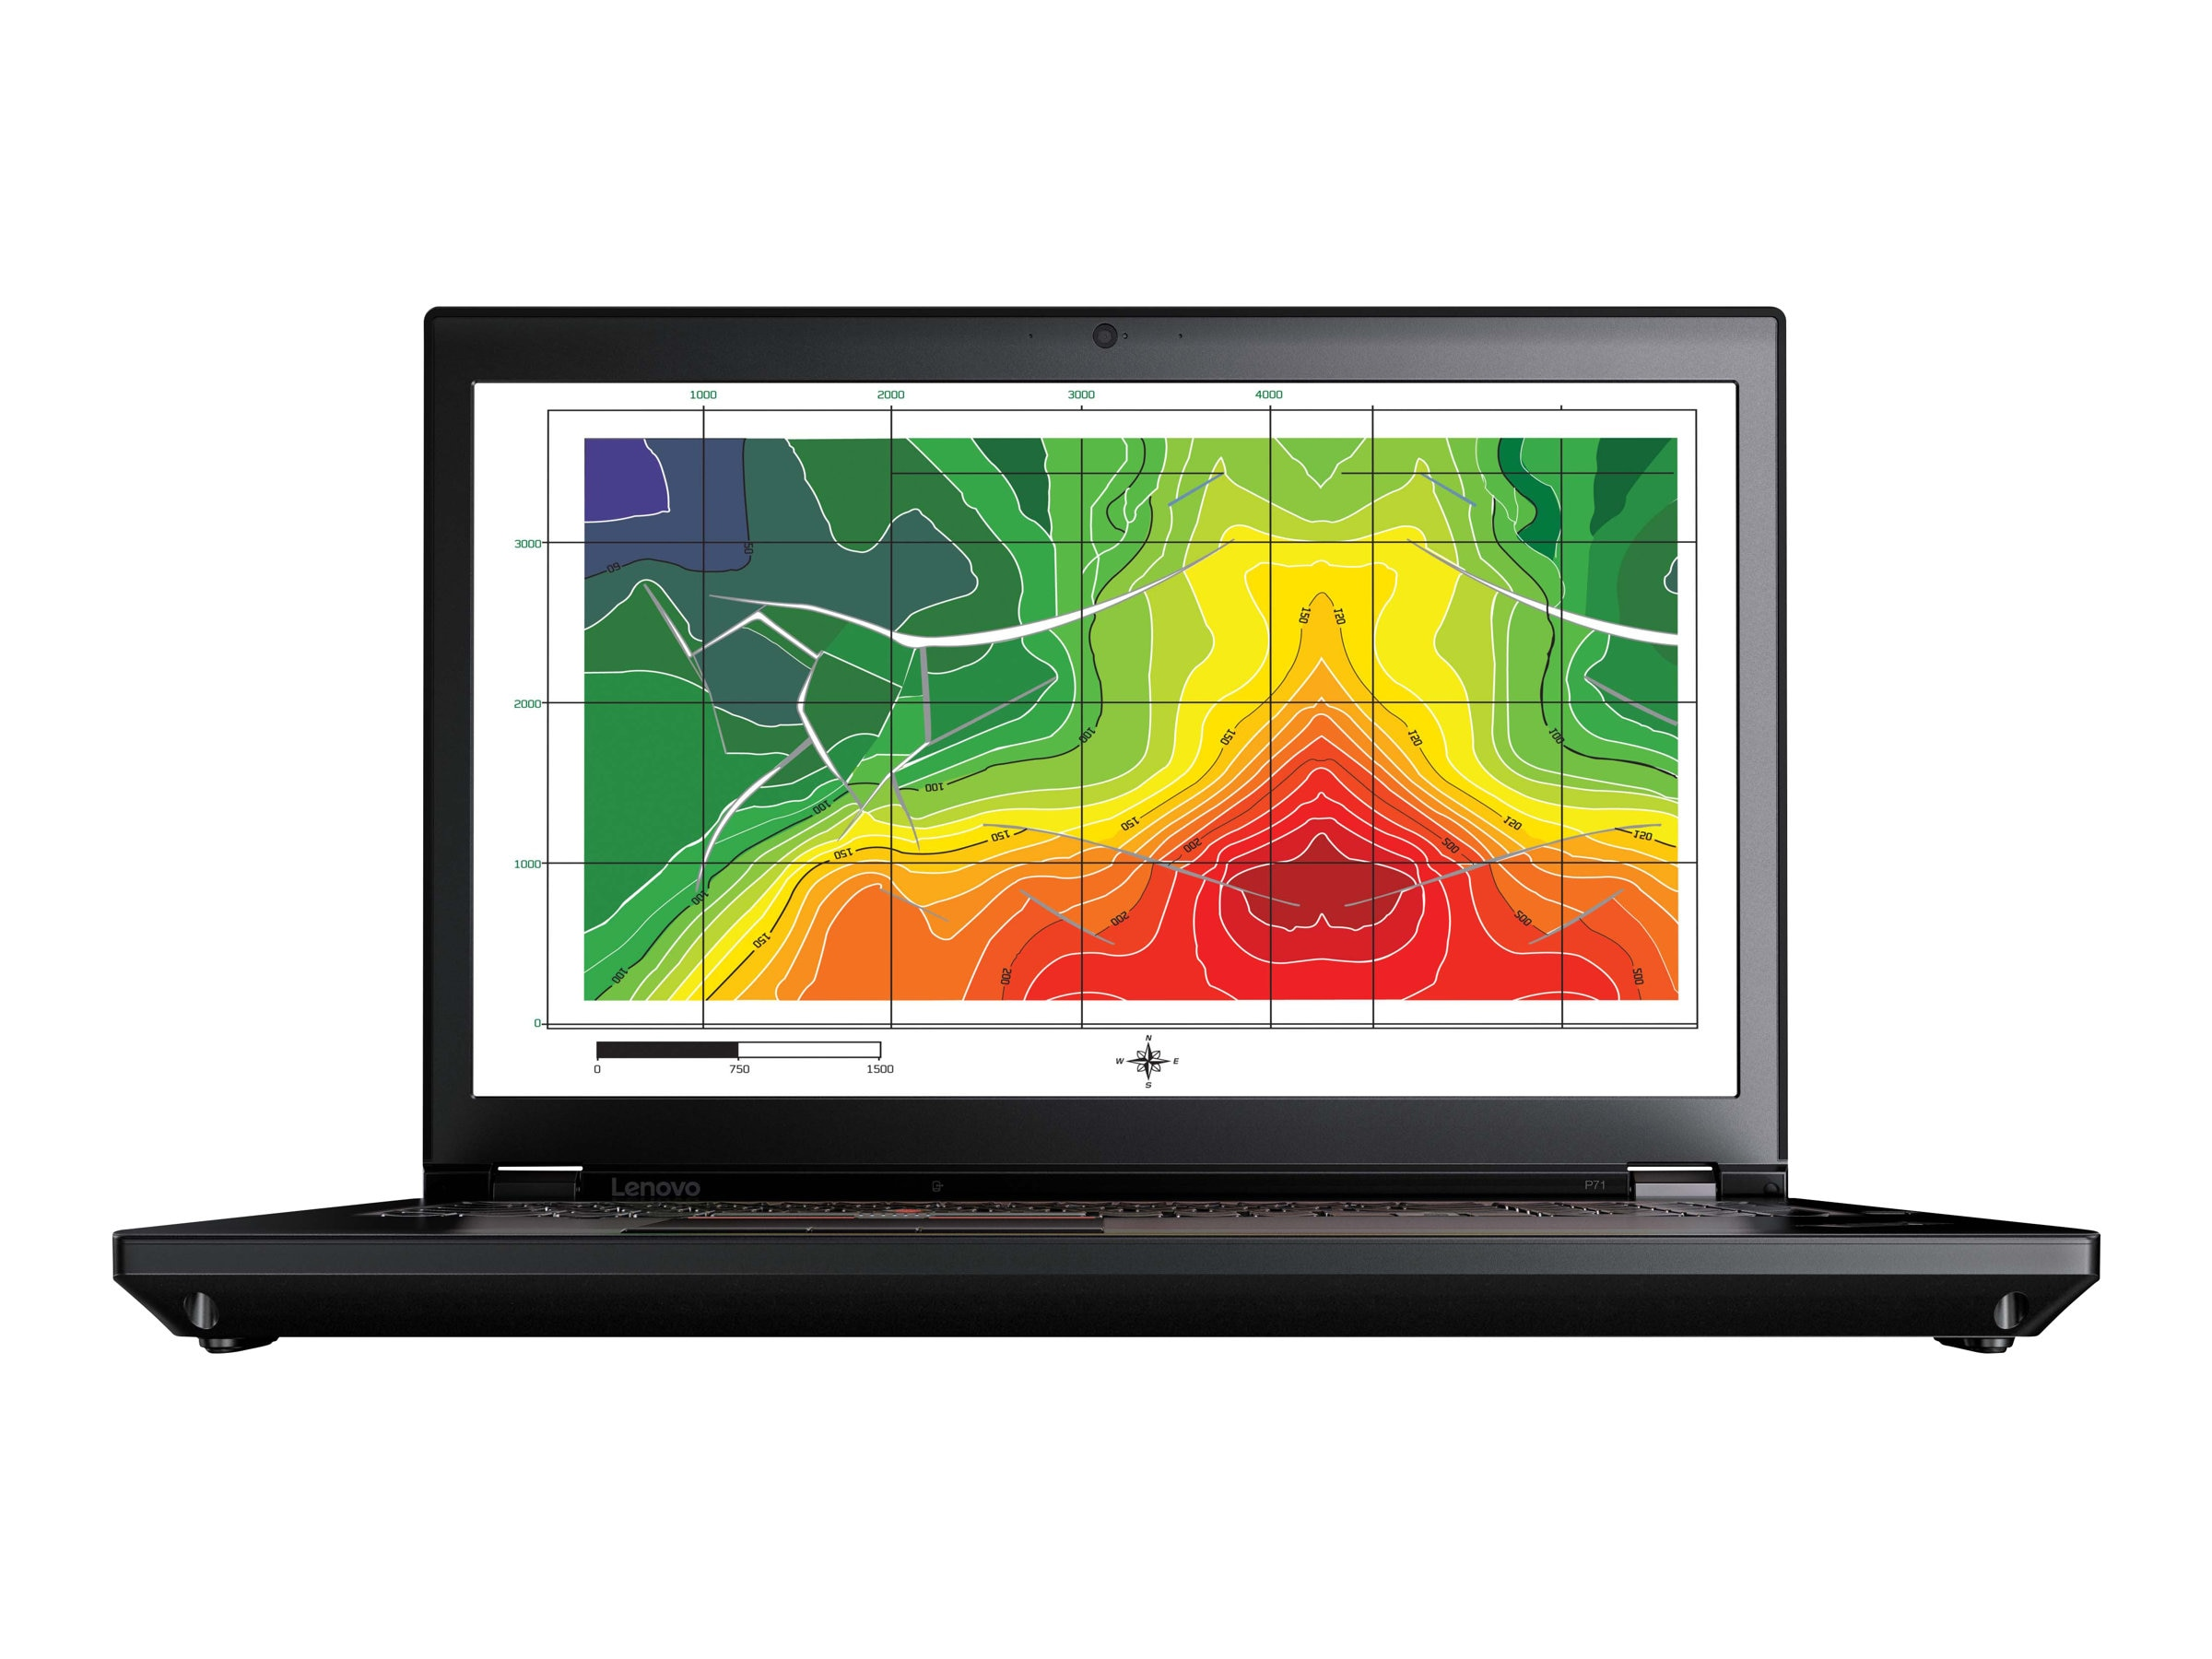 Lenovo TopSeller ThinkPad P71 Xeon E3-1505M v6 3.0GHz 16GB 256GB PCIe ac BT FR SC P3000M 17.3 FHD W10P64